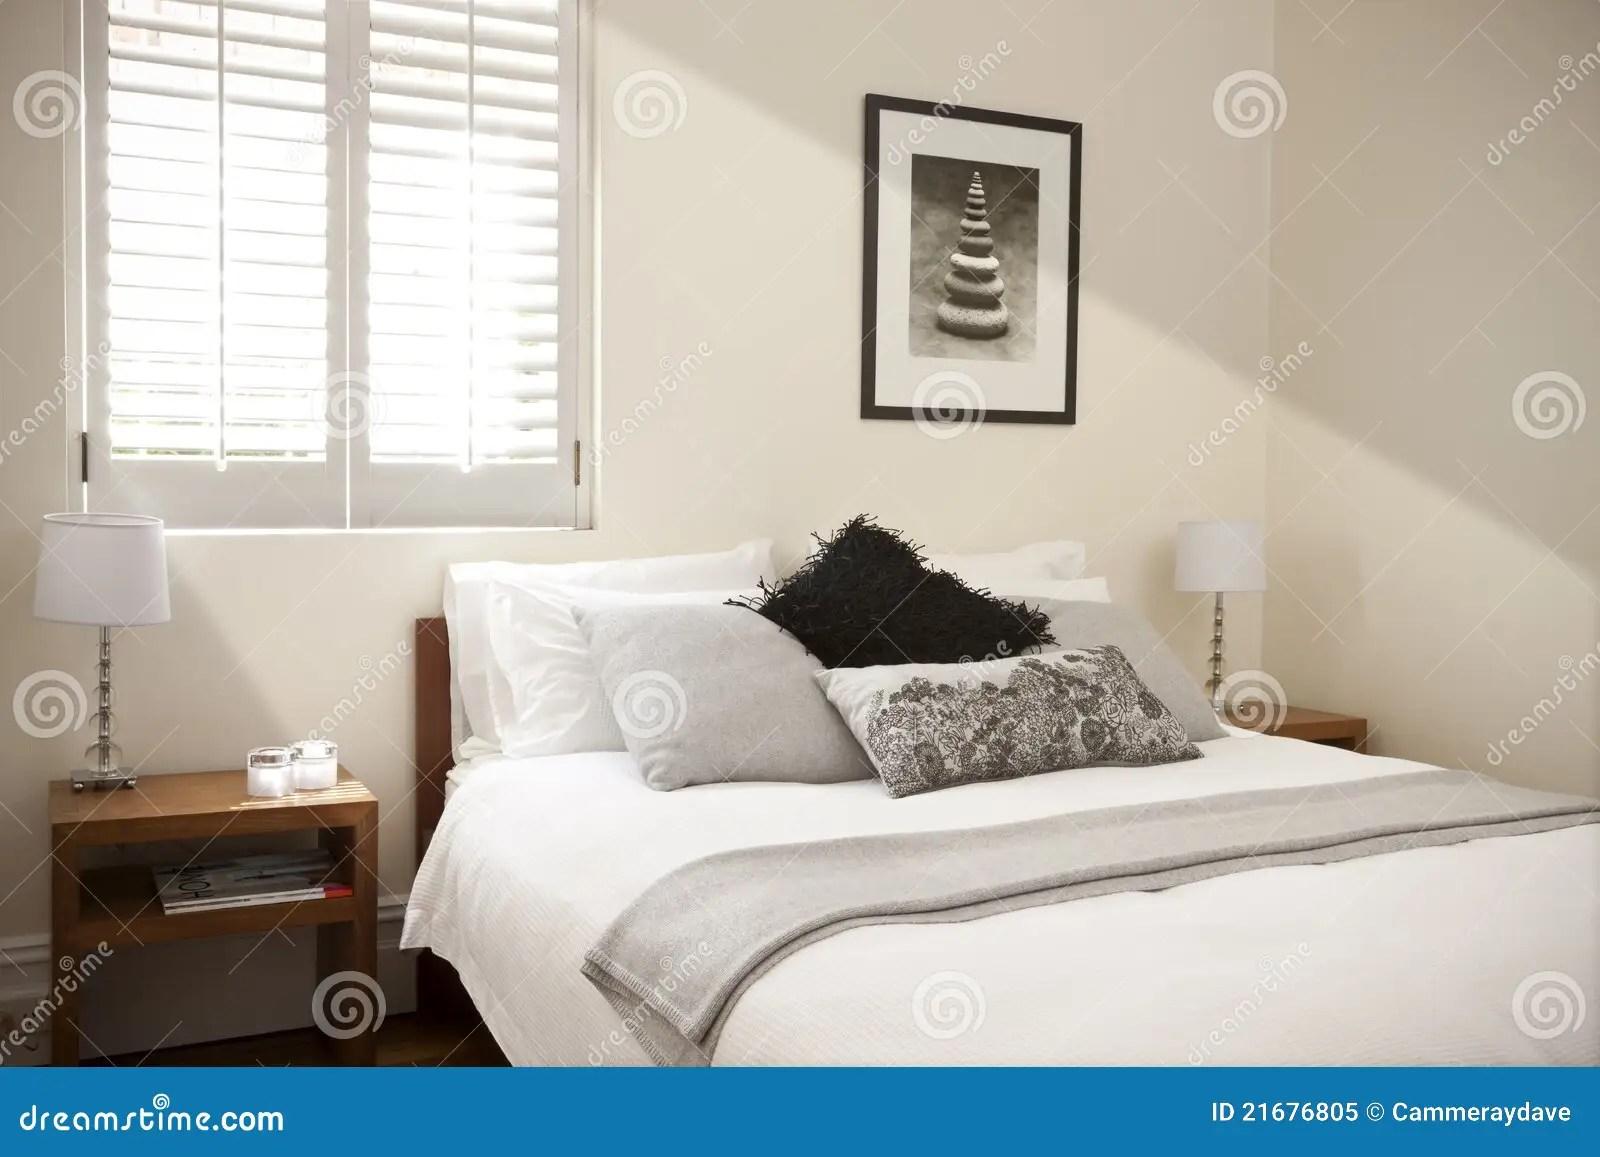 pictures modern living room interior design home furniture sets bedroom bed light royalty free stock photo ...